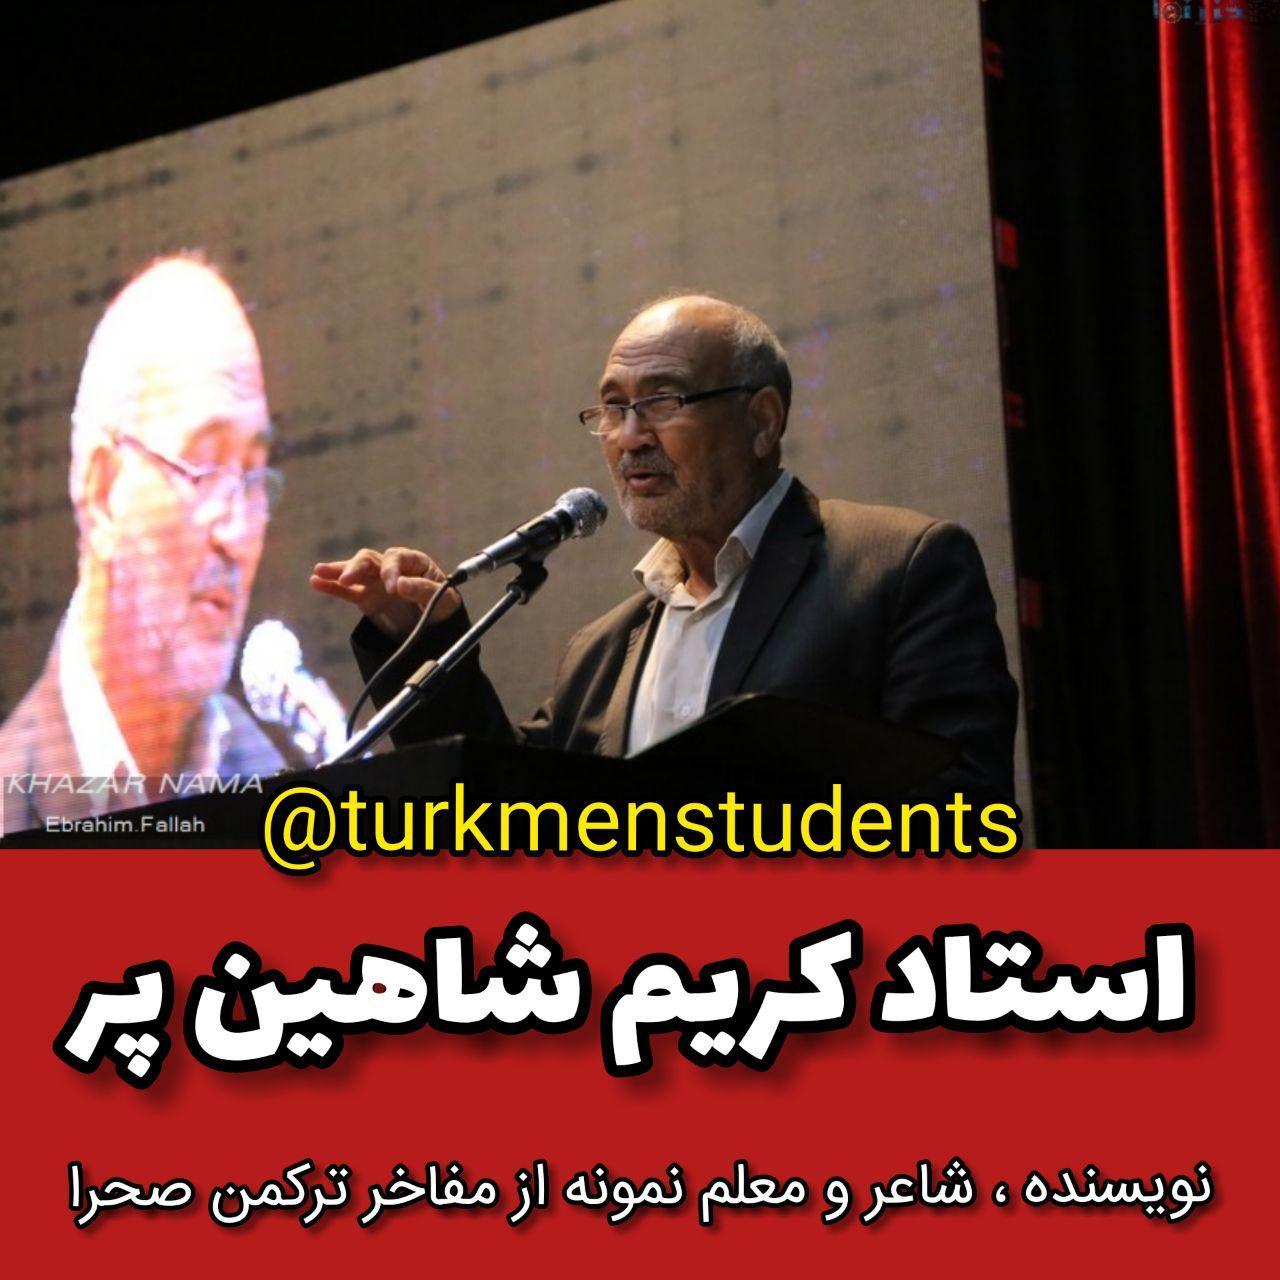 استاد کریم شاهین پر نویسنده، شاعر و معلم نمونه از مفاخر ترکمن صحرا